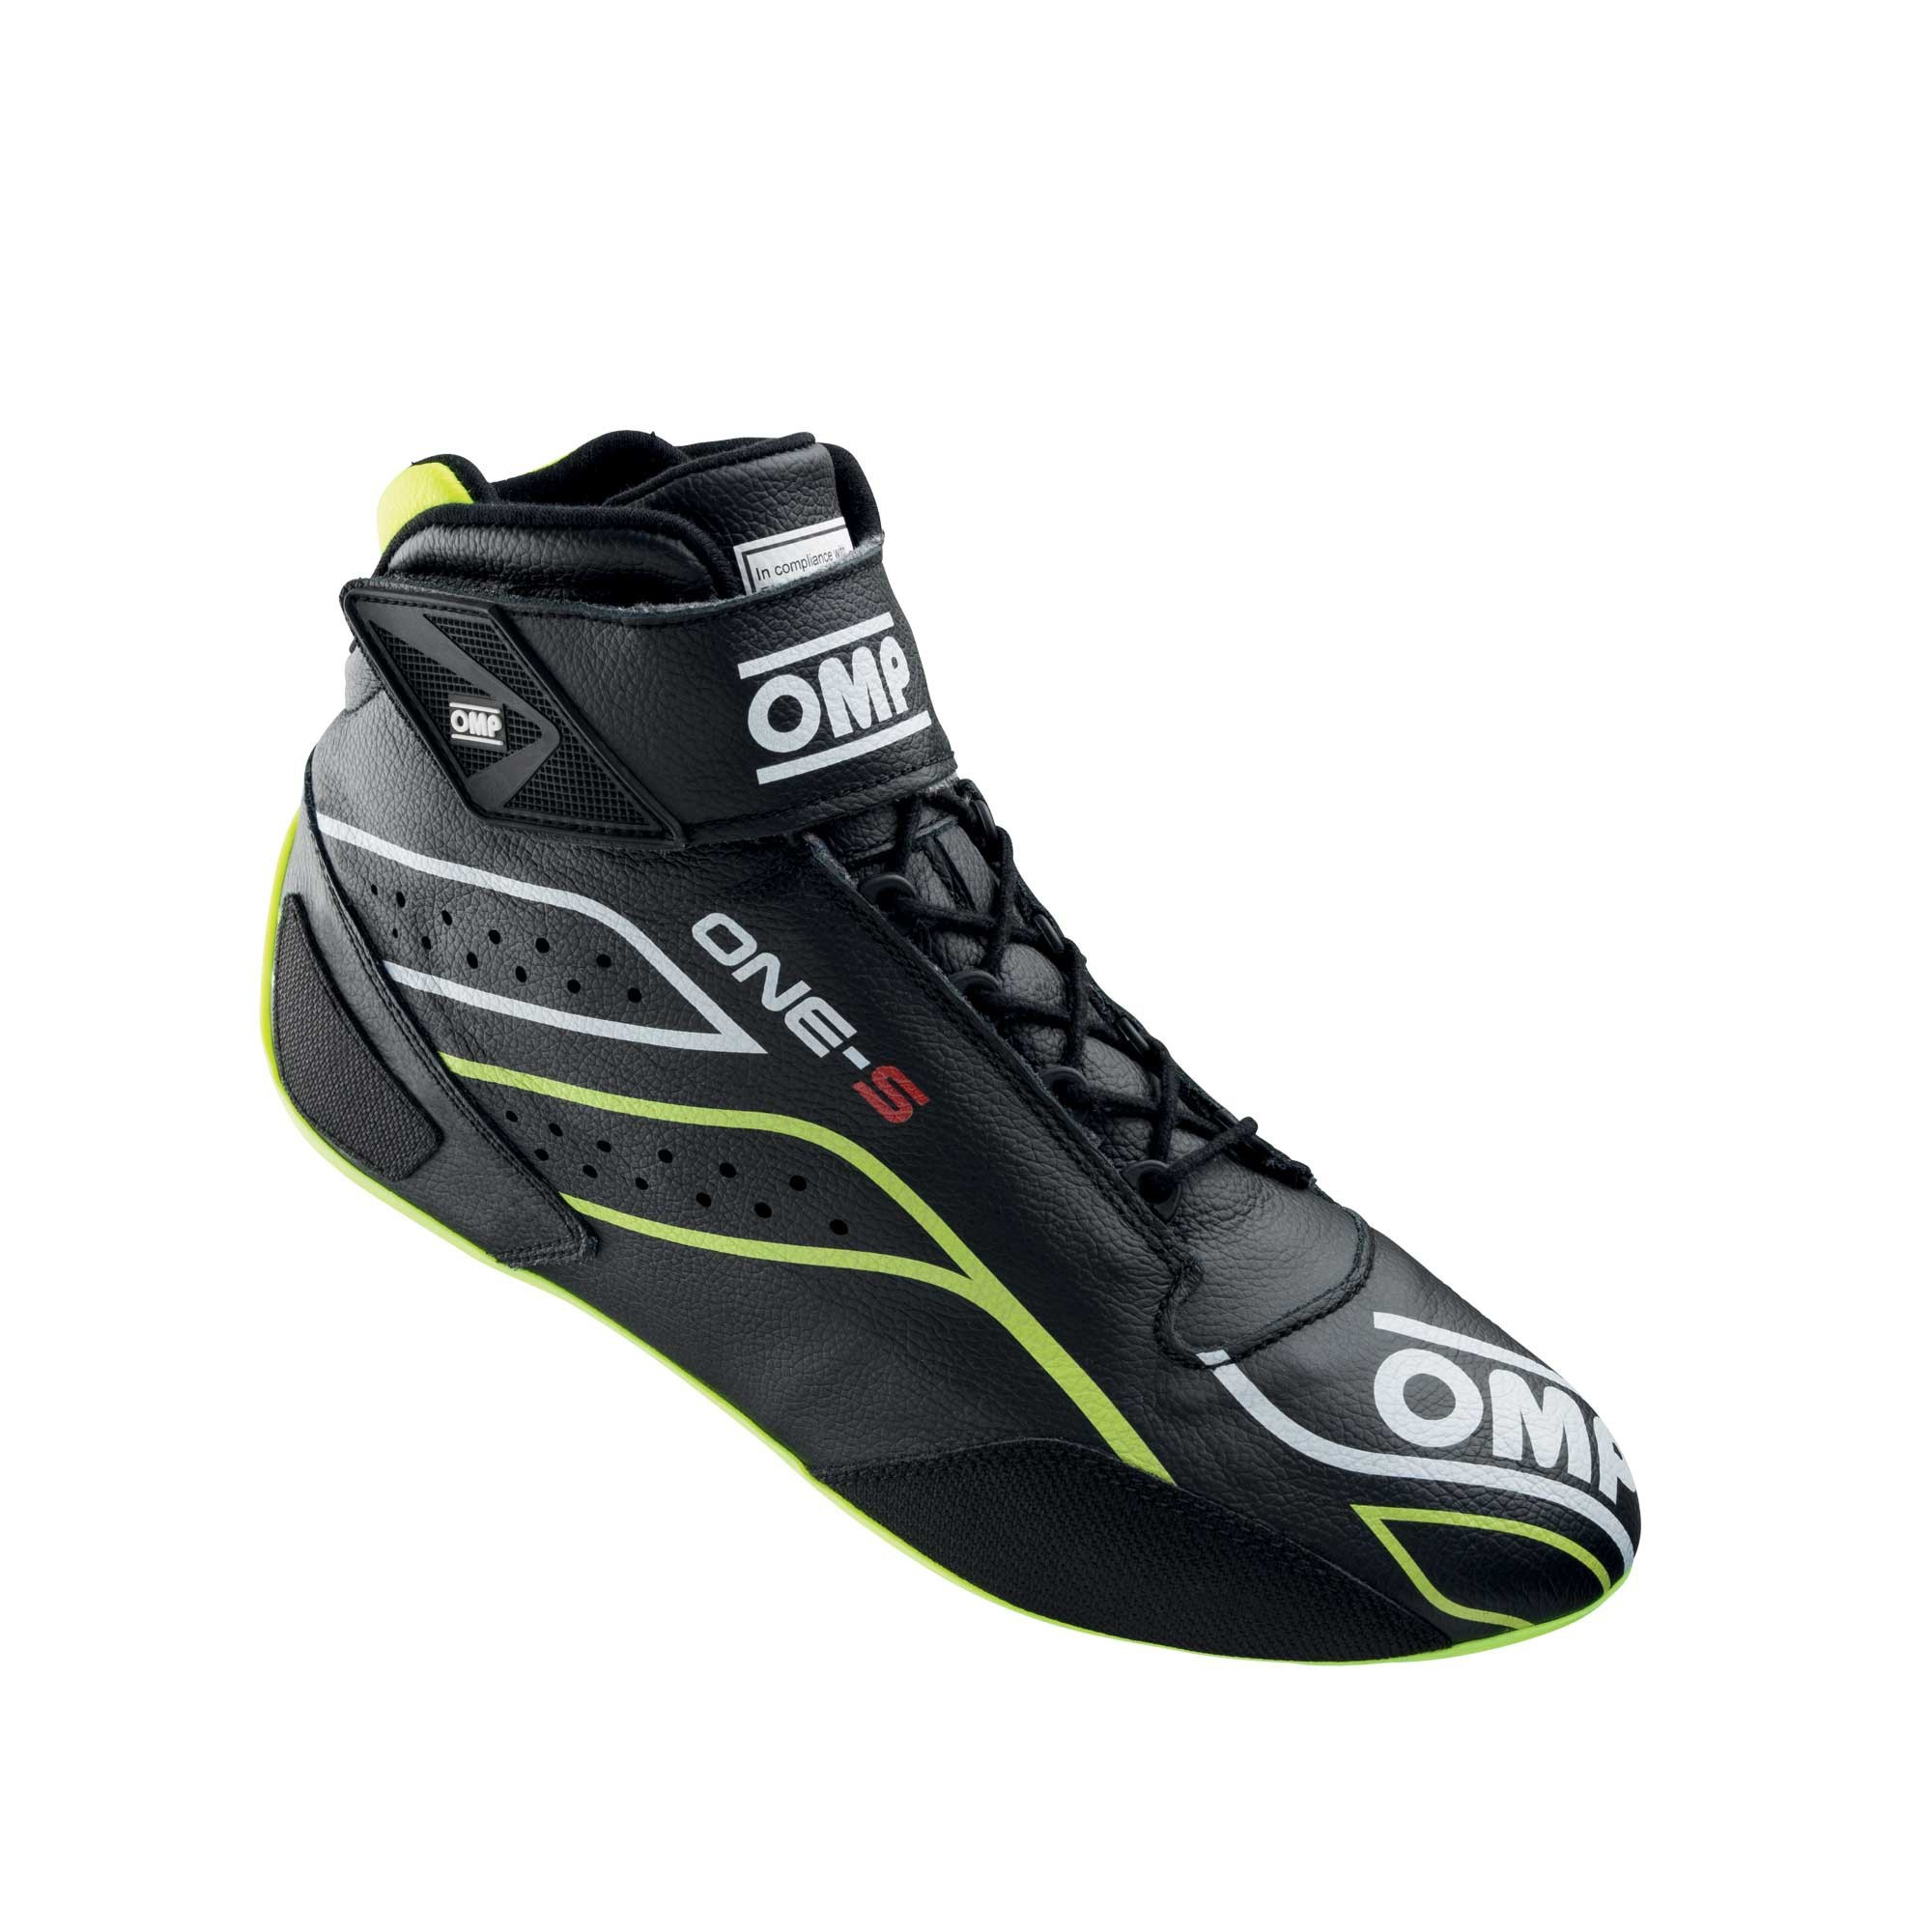 Sapatilha Racing ONE-S 2020 OMP